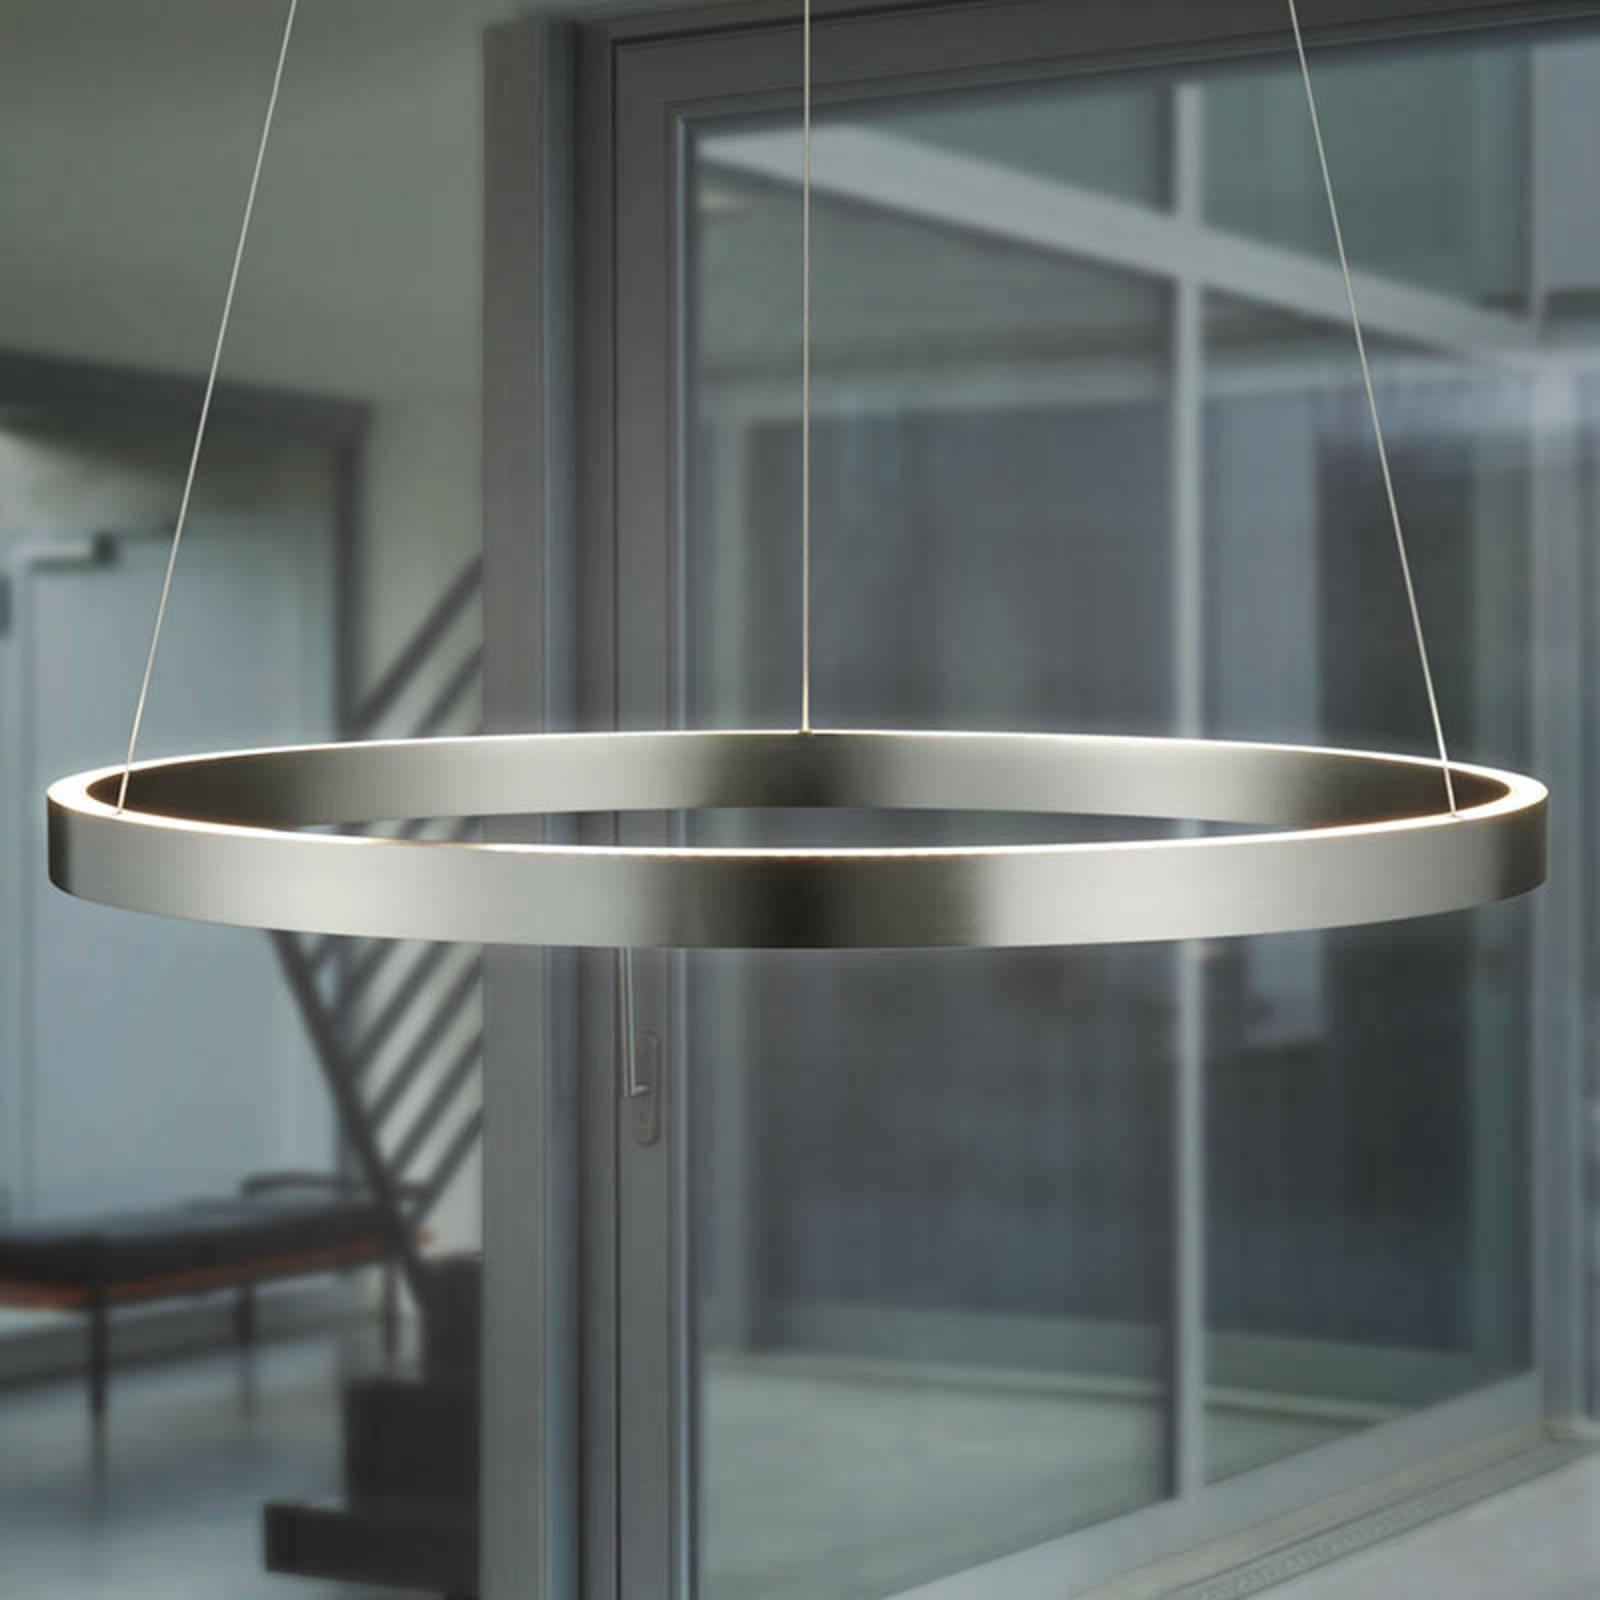 Lampa wisząca LED Circle, sterowana gestami